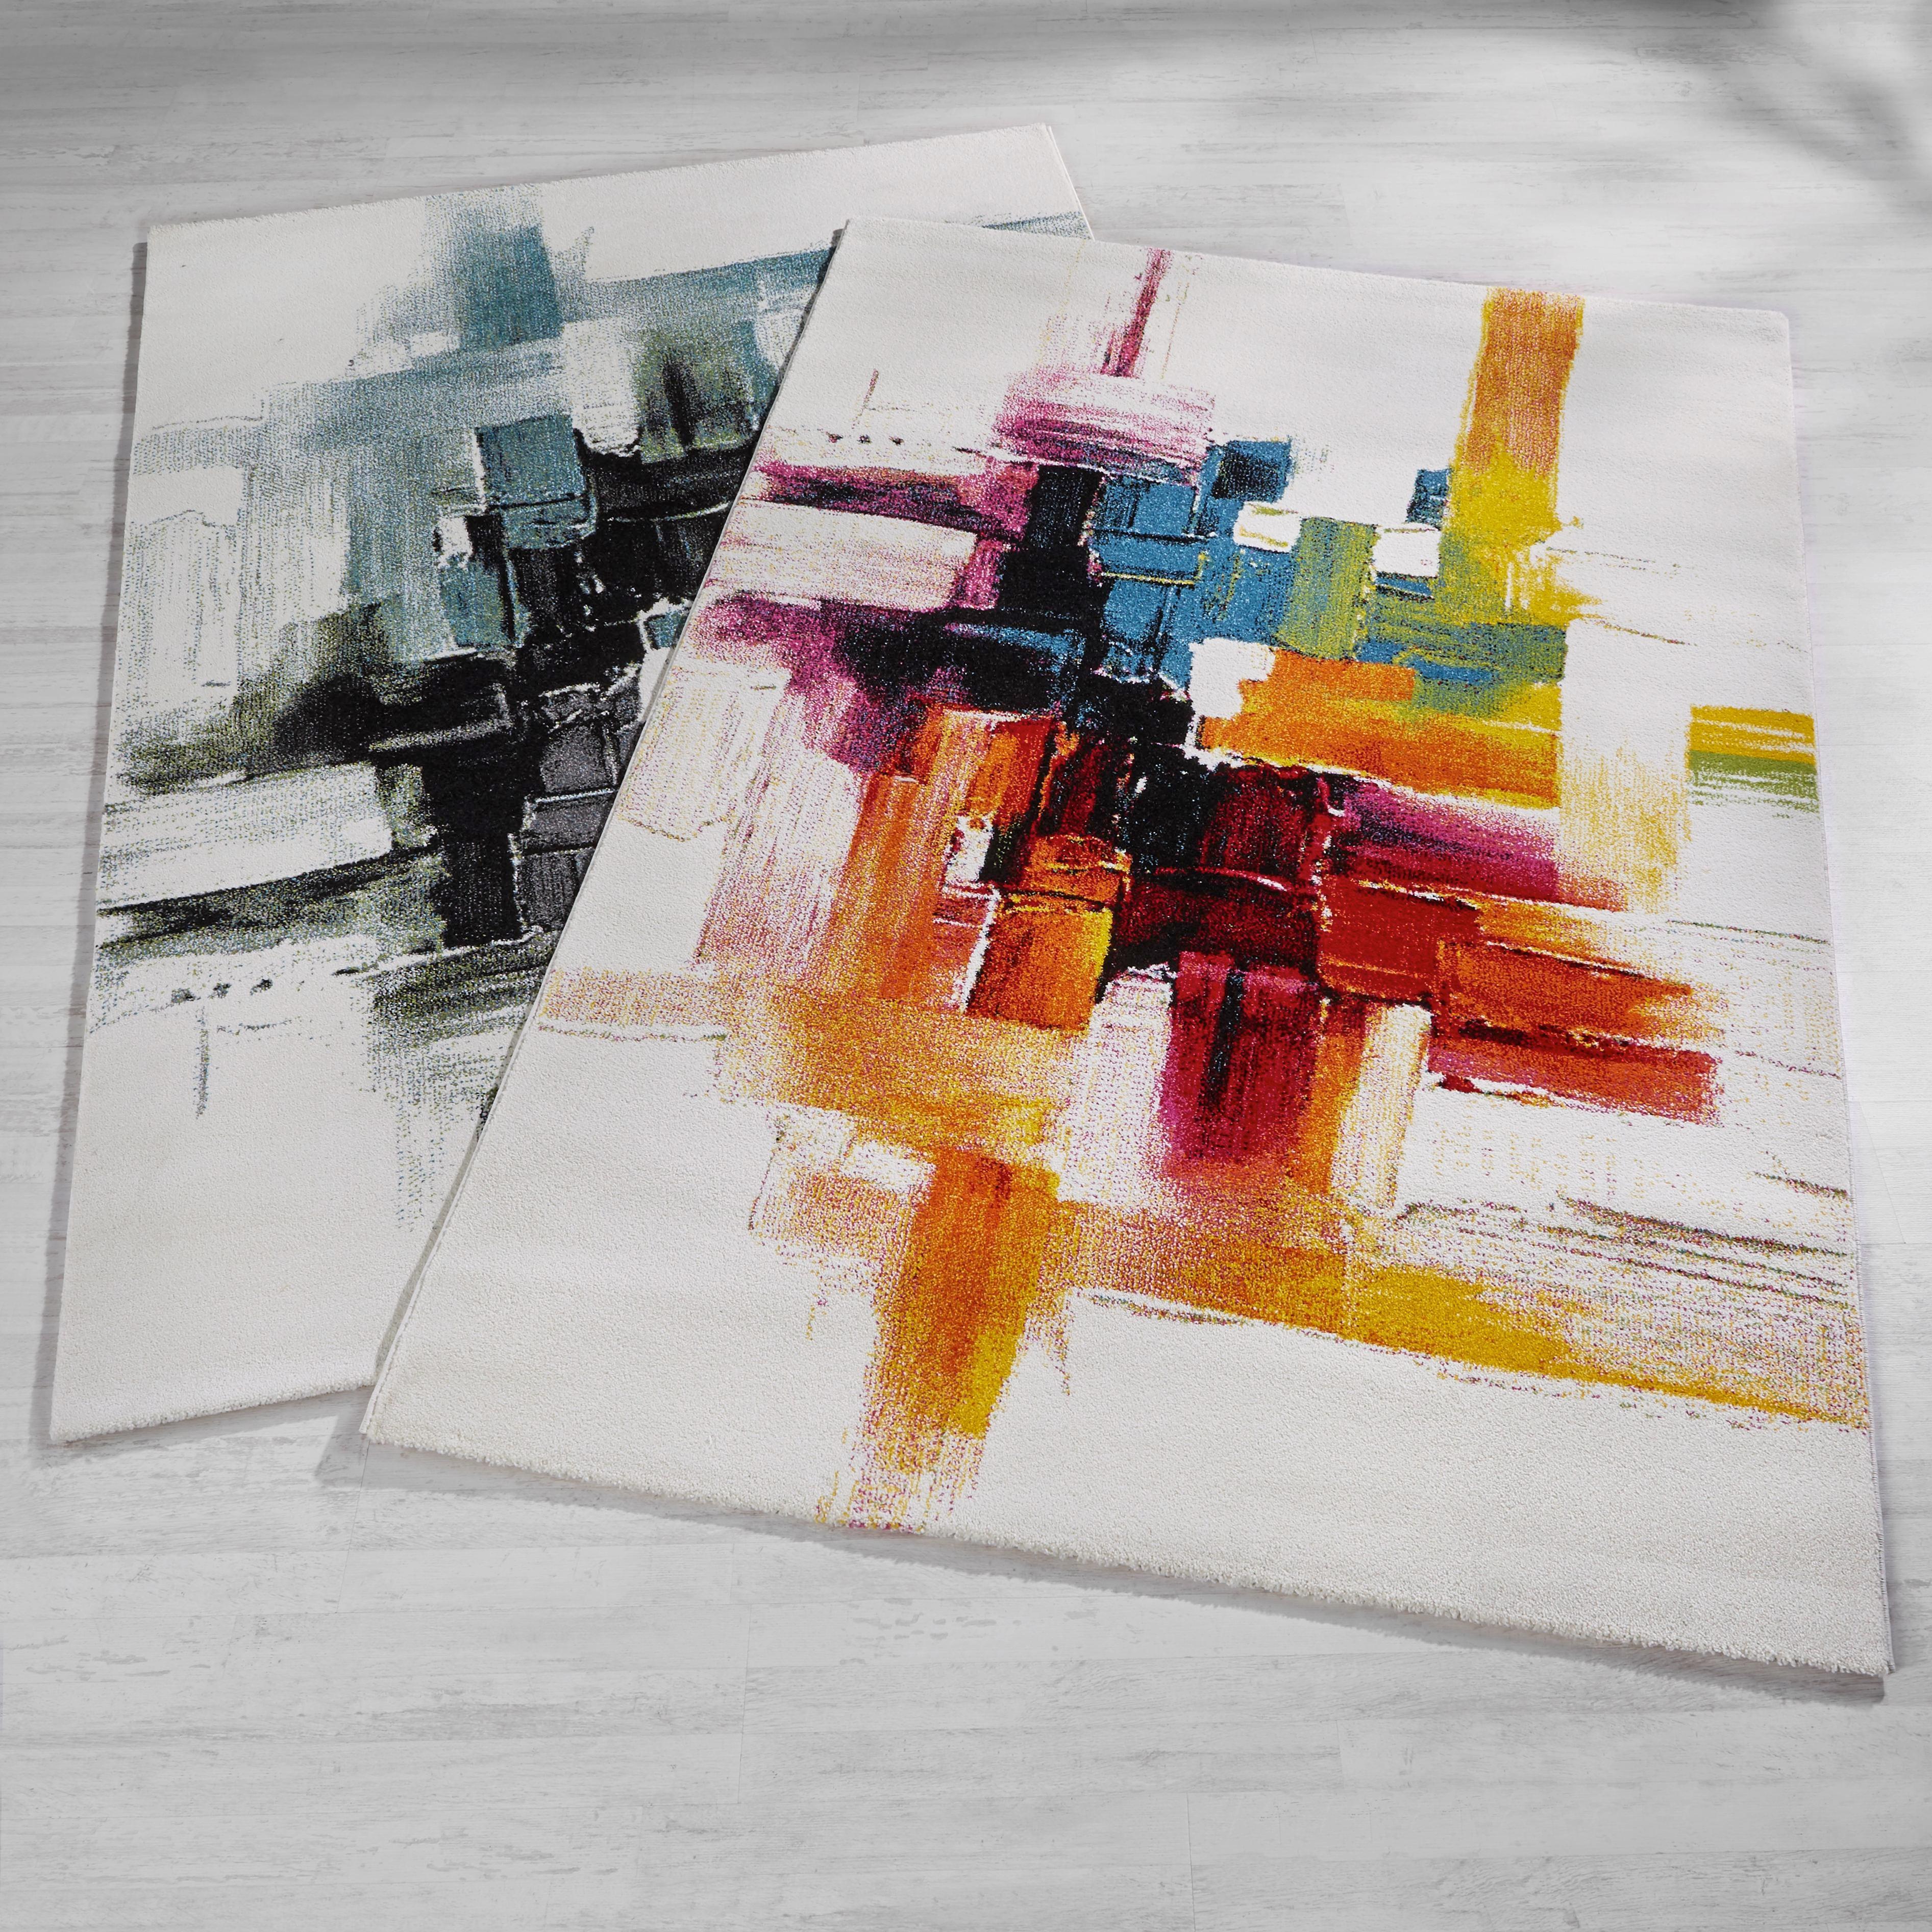 Webteppich abstract in Bunt, ca.120x170cm - Multicolor, LIFESTYLE, Textil (120/170cm) - MÖMAX modern living